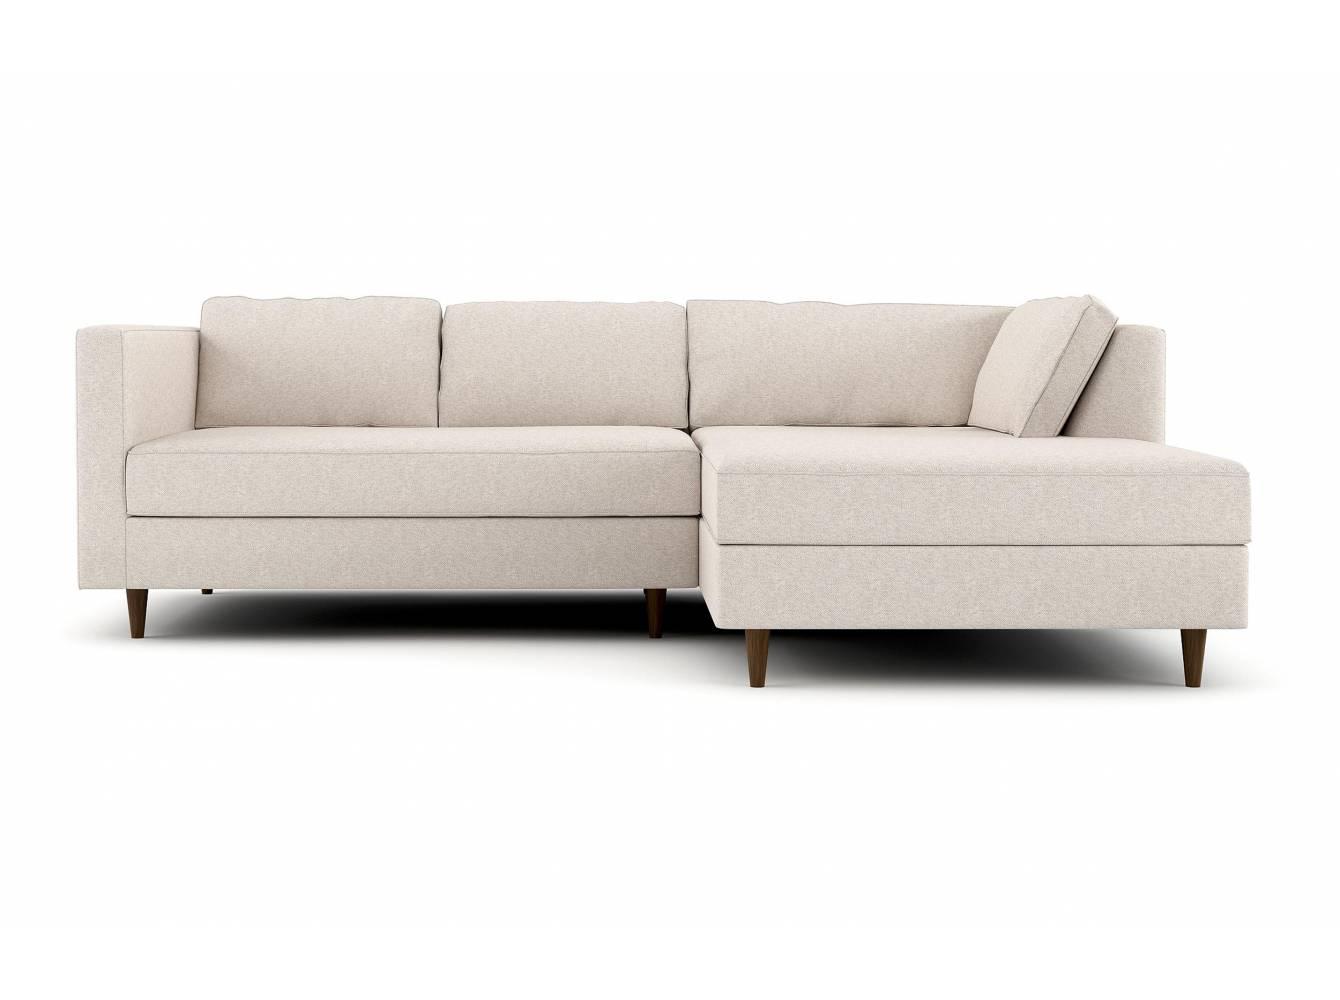 Good Non Toxic Sofa   Stem Mota Apartment Bumper Sectional